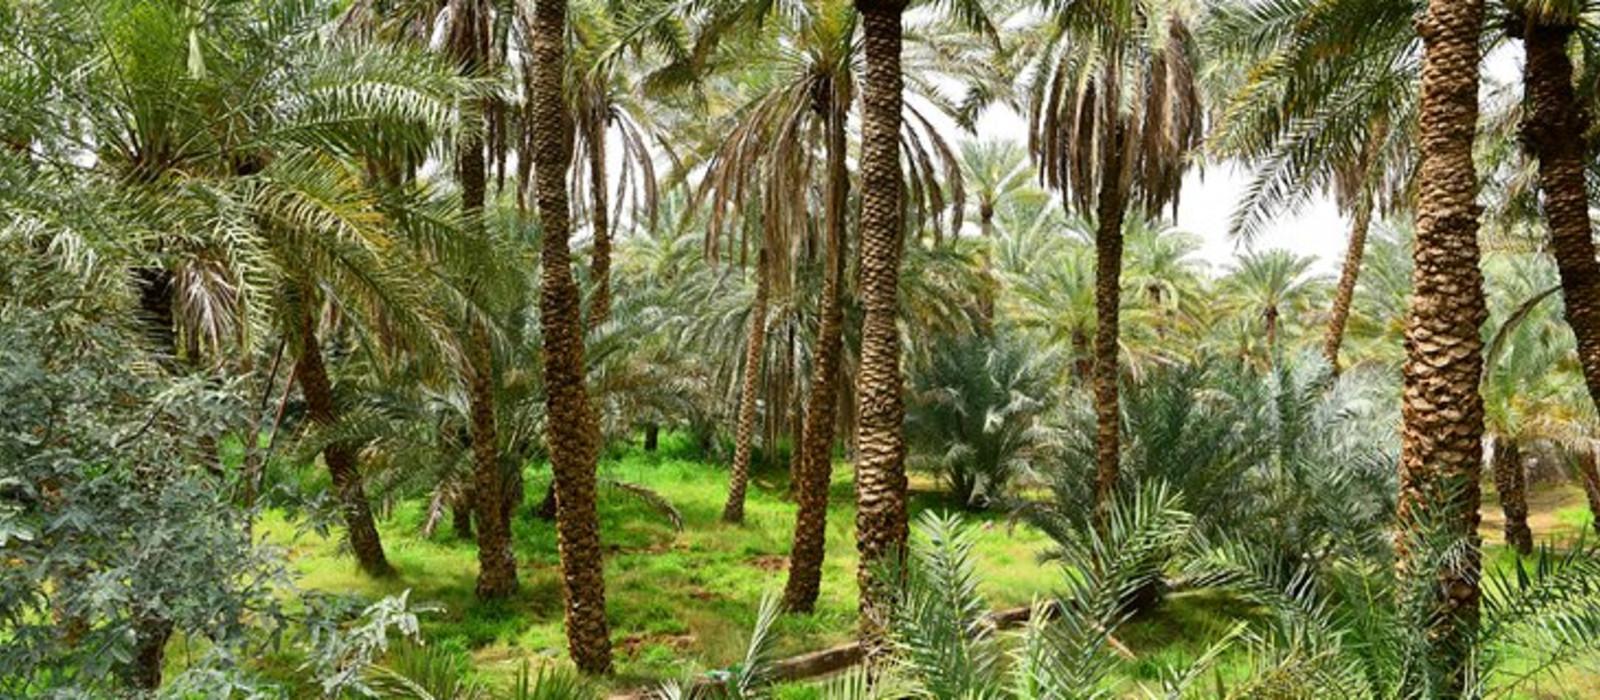 Destination Al Ain United Arab Emirates